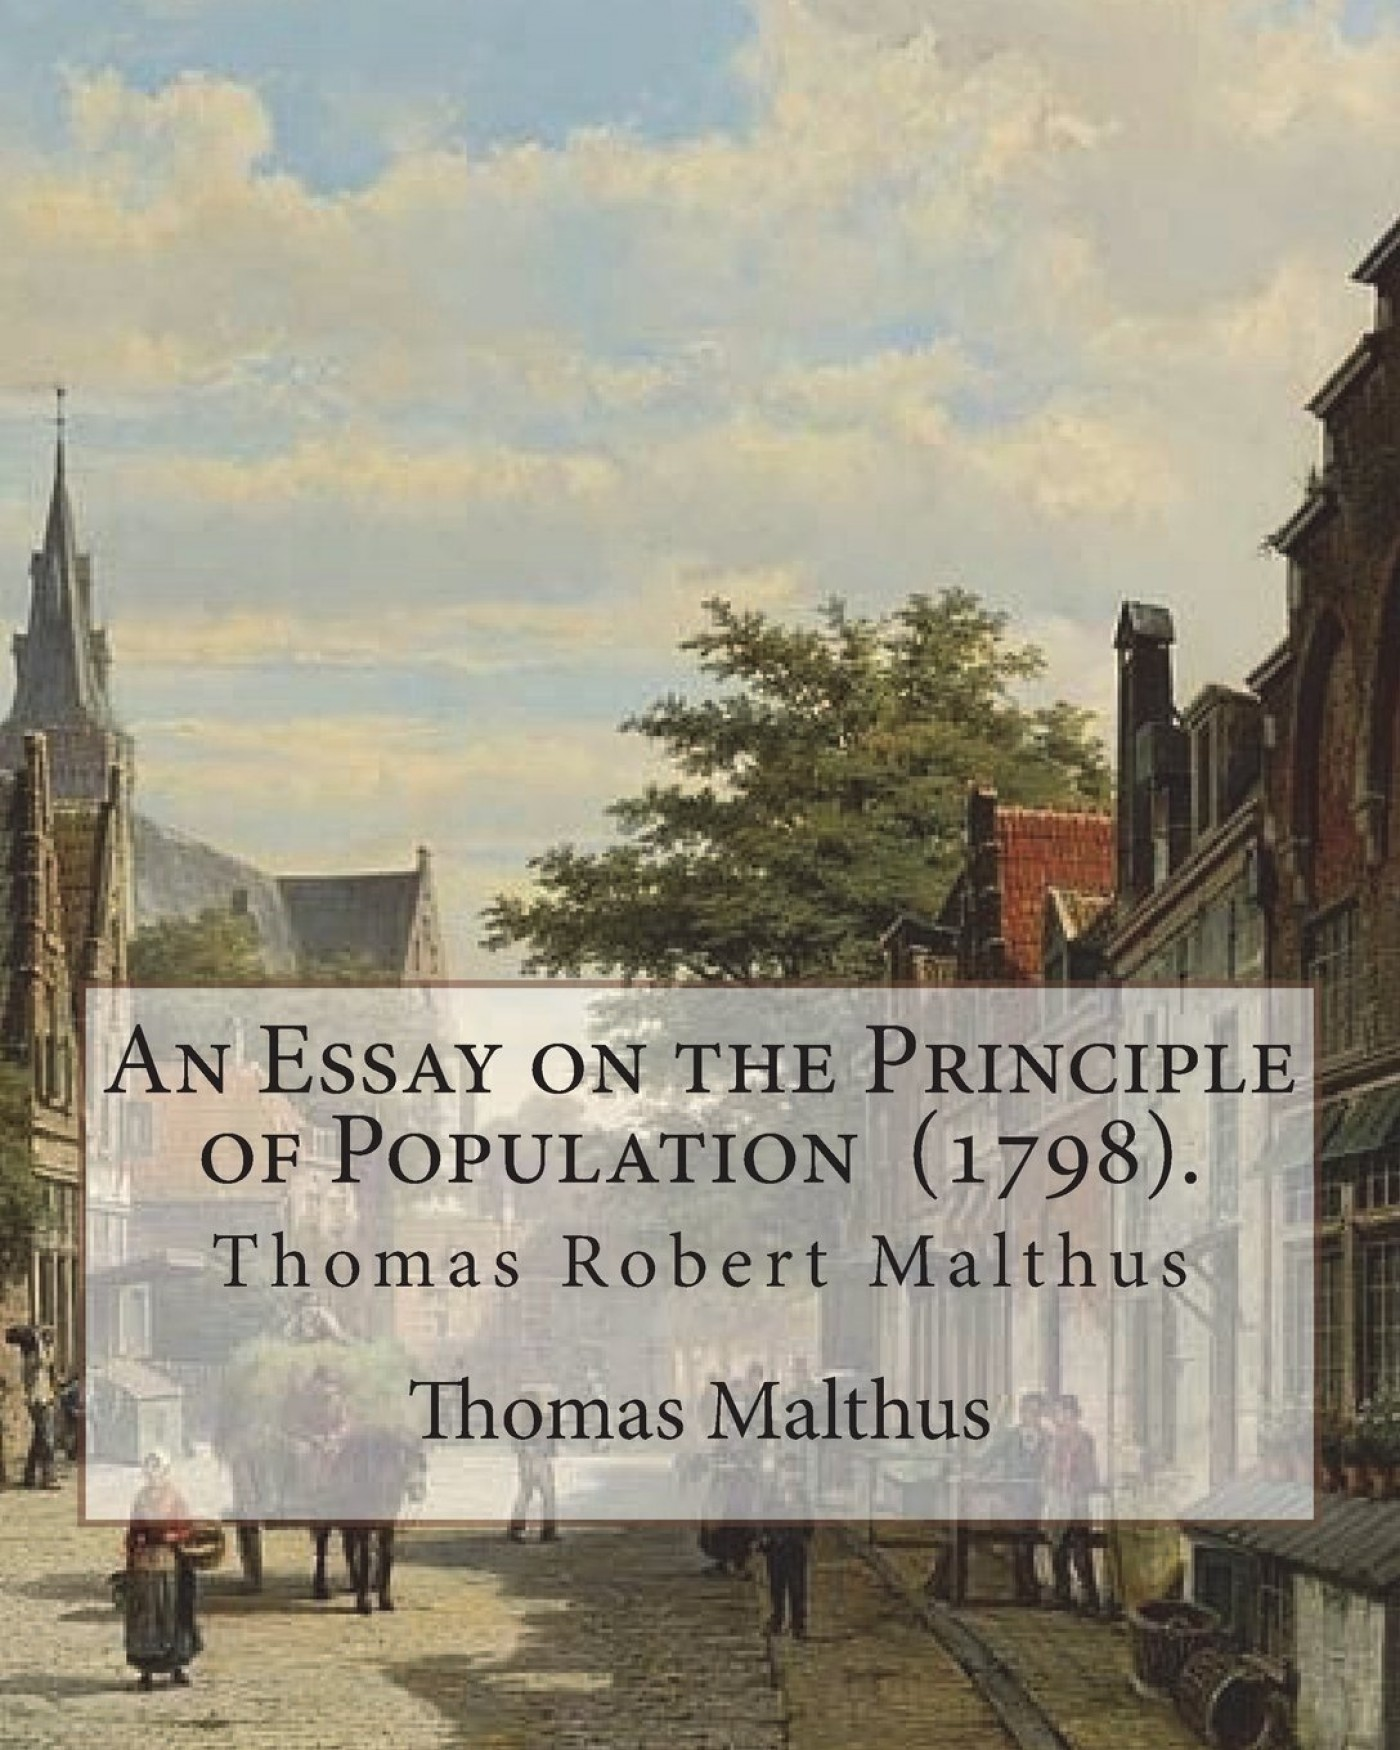 018 Essay On The Principle Of Population 71giypnbhsl Singular Malthus Sparknotes Thomas Main Idea 1400